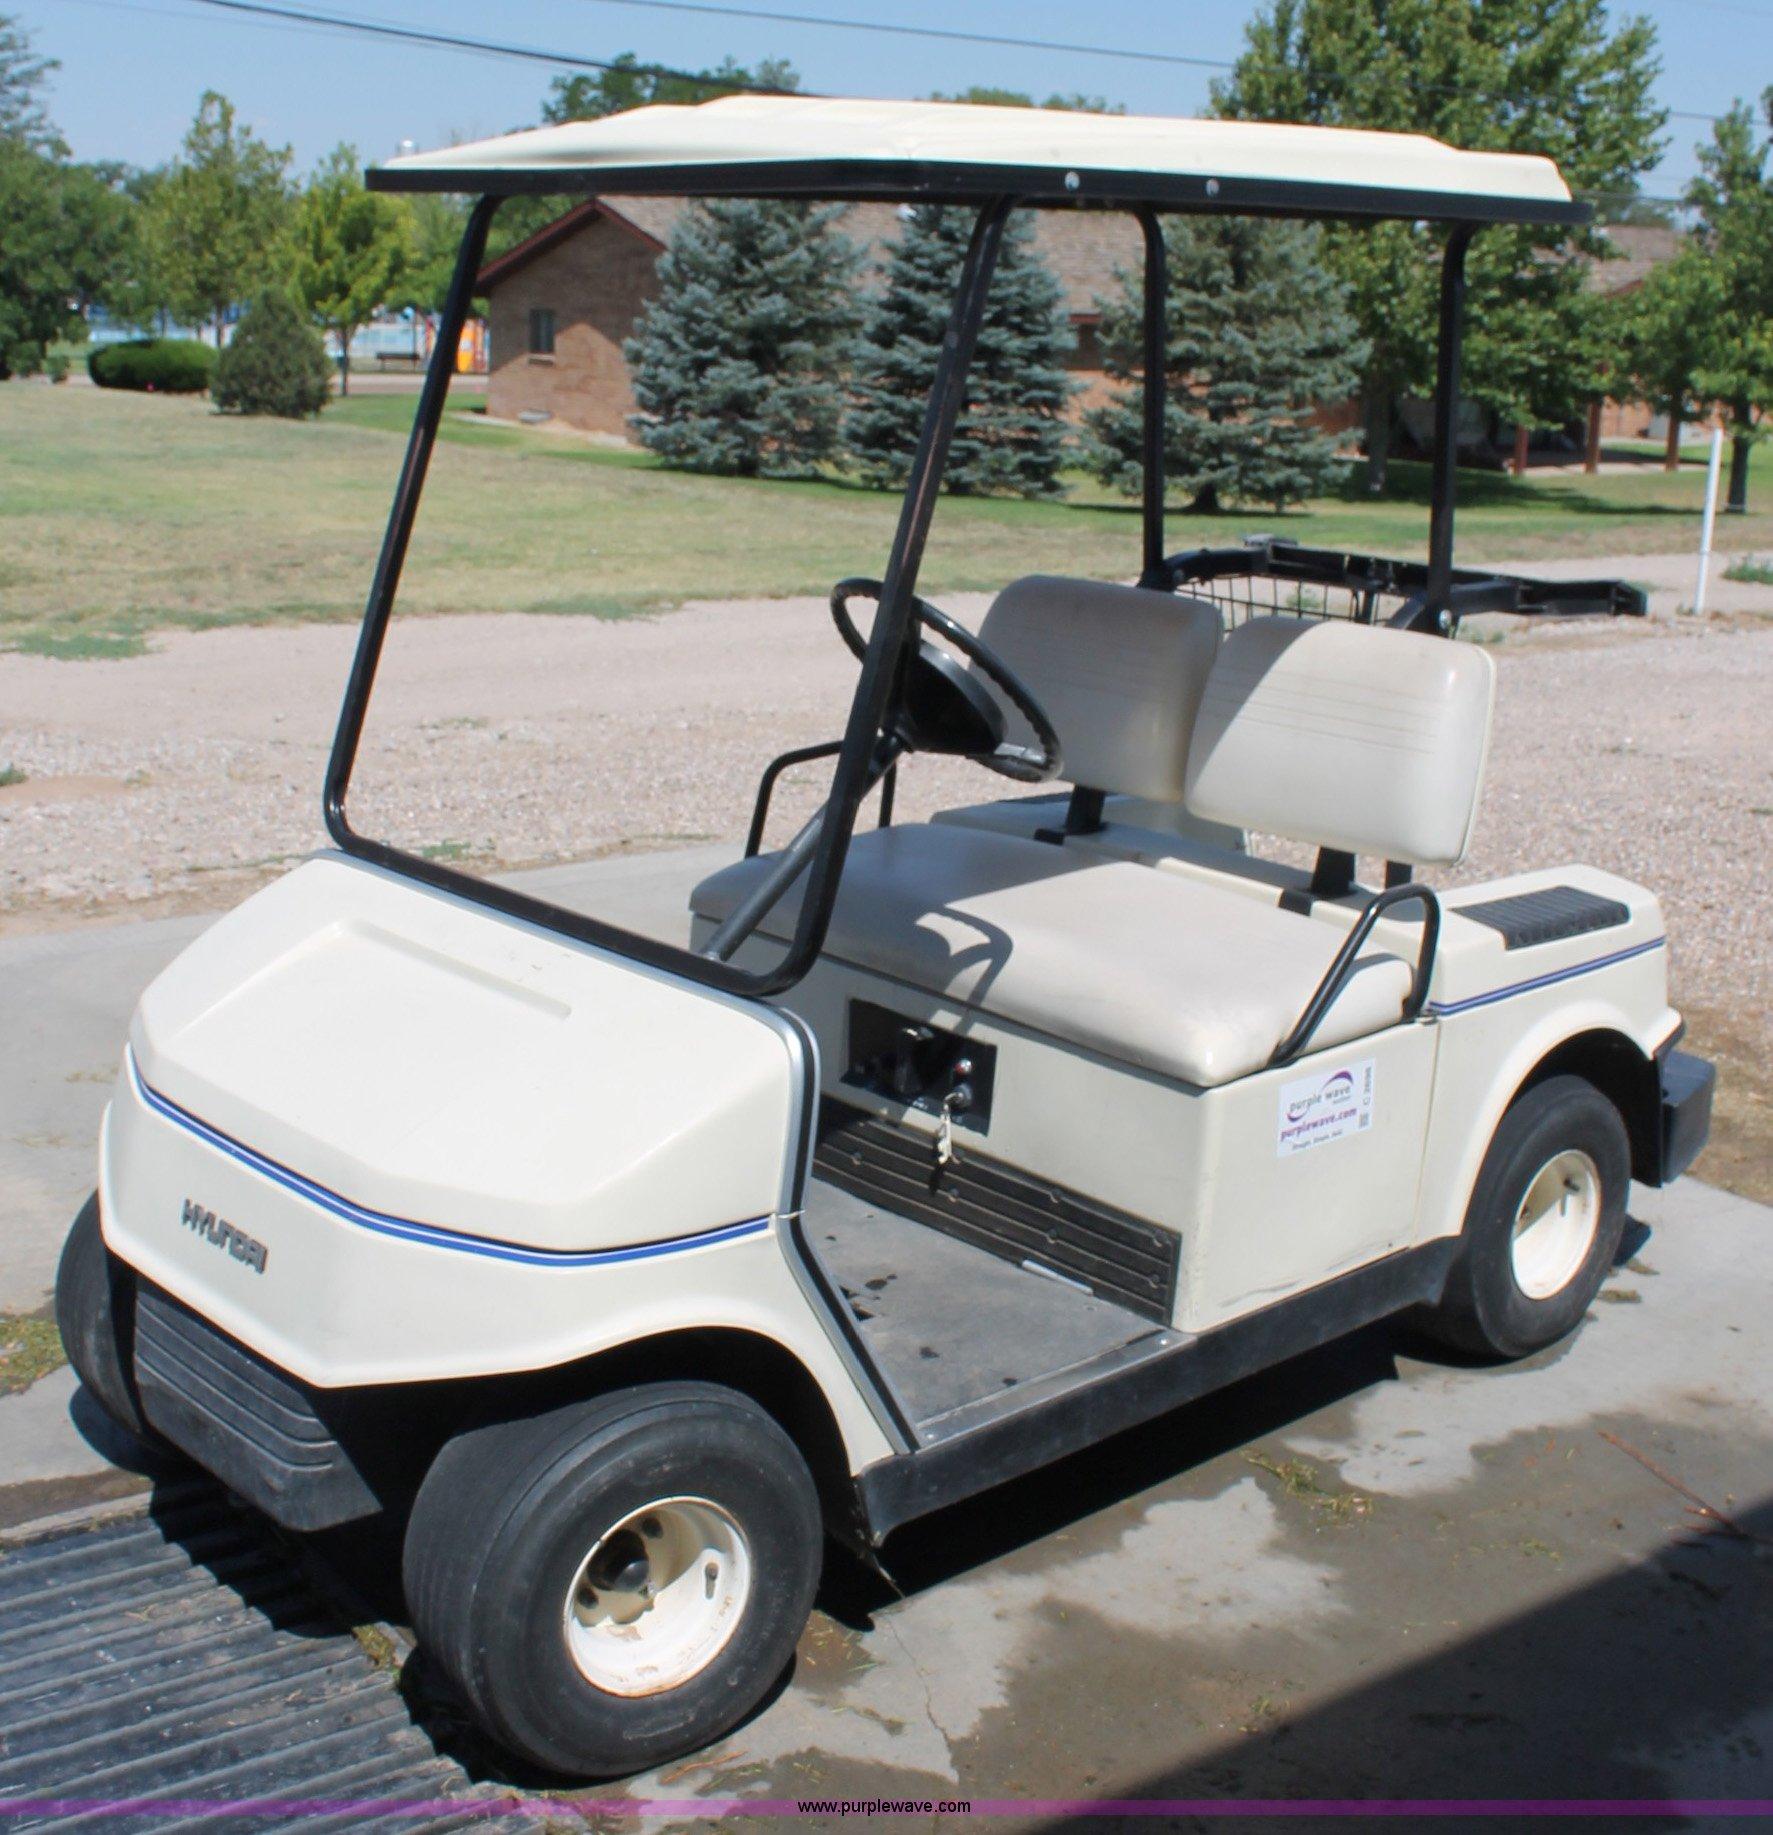 Hyundai golf cart   Item C2698   SOLD! Tuesday August 7 Gove... on golf carts junk, golf carts furniture, golf carts auction, golf carts maintenance, golf carts parts breakdown, golf cart wrecks,